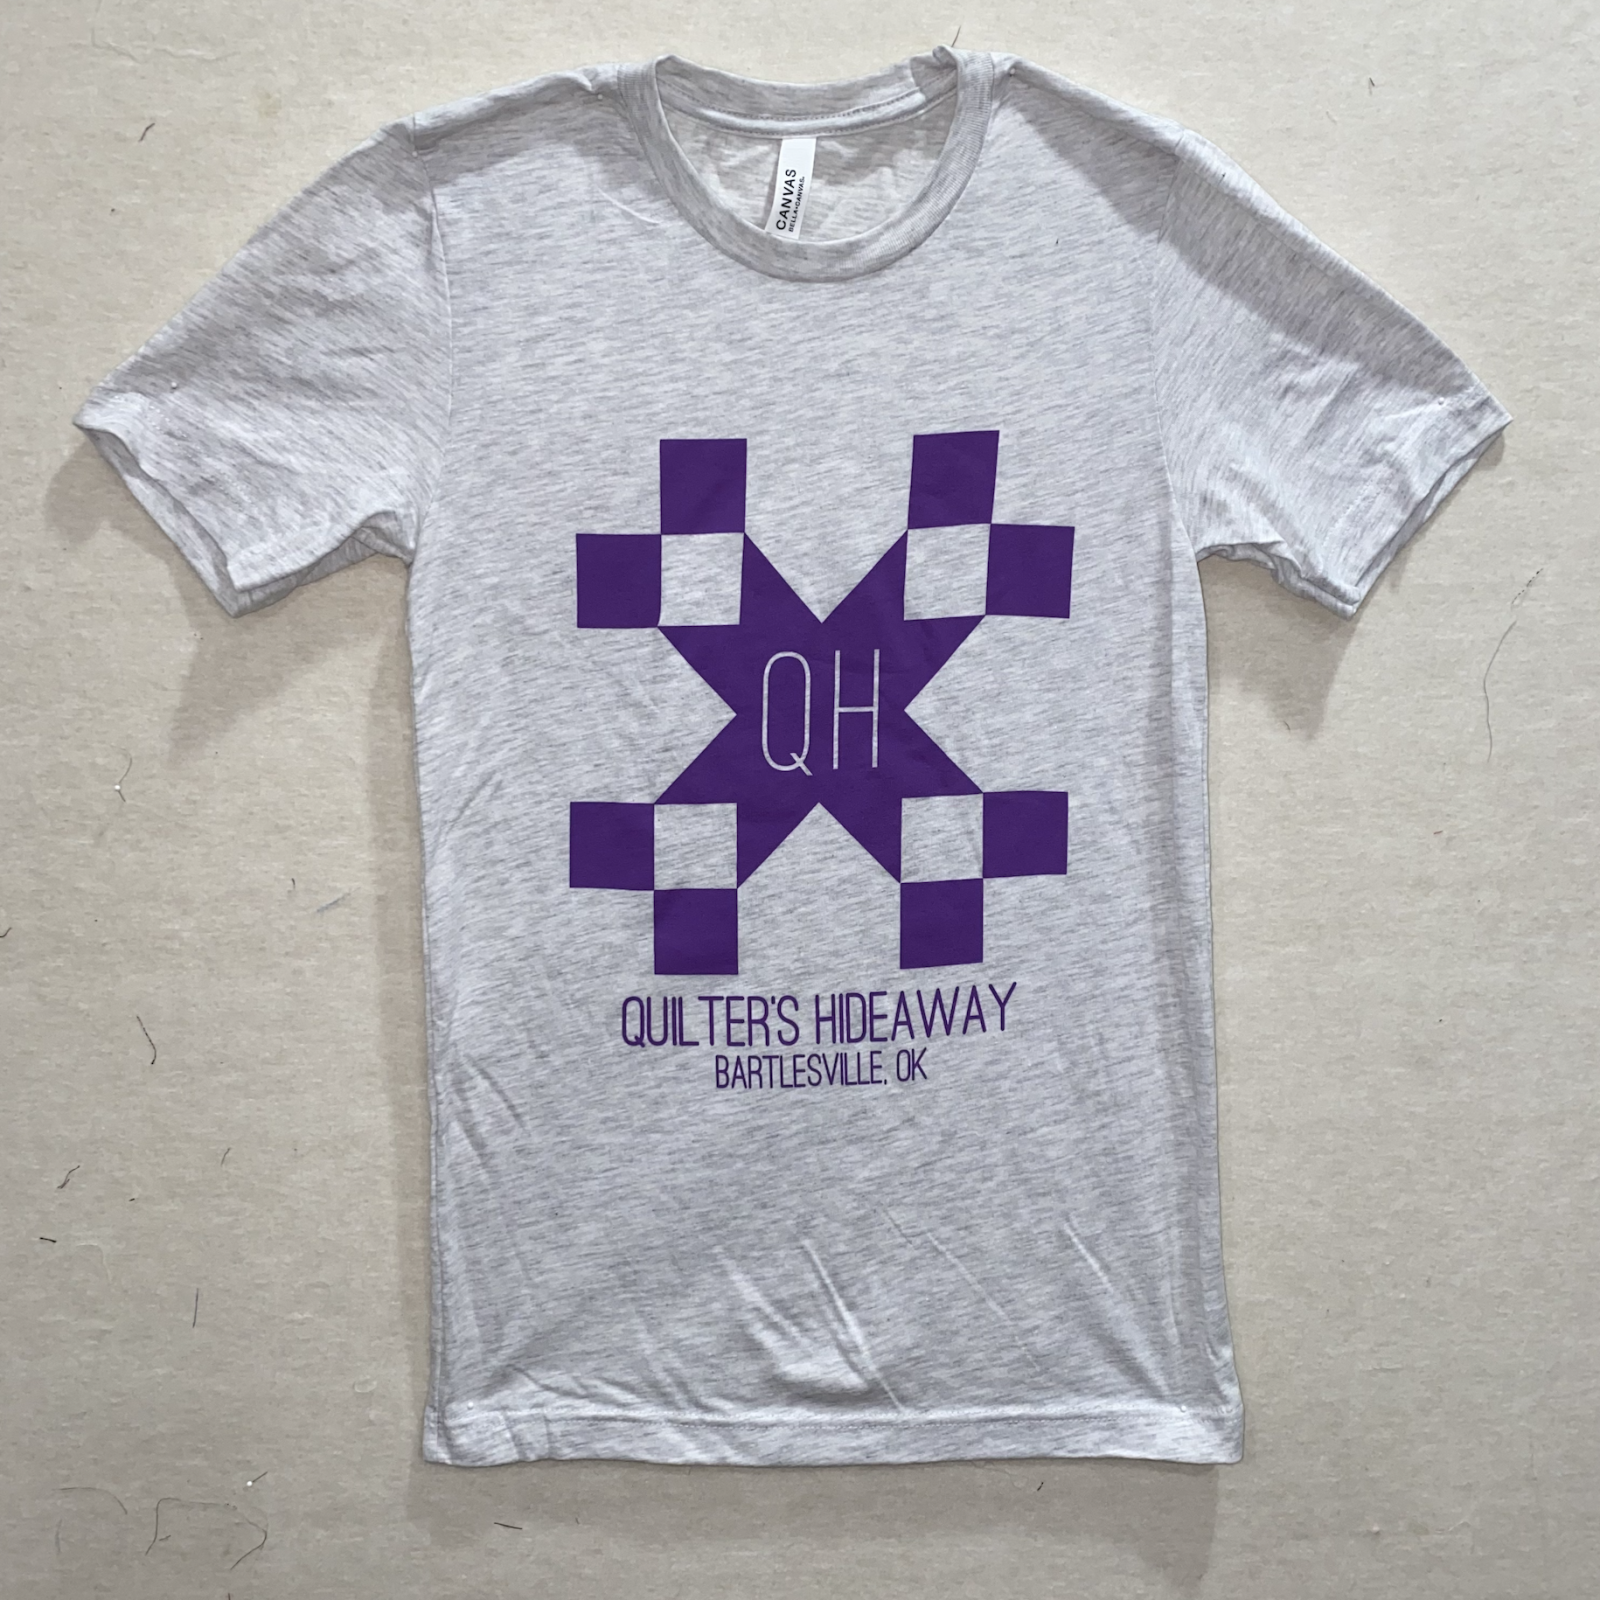 QH Ash Short Sleeve T Shirt - 2XL